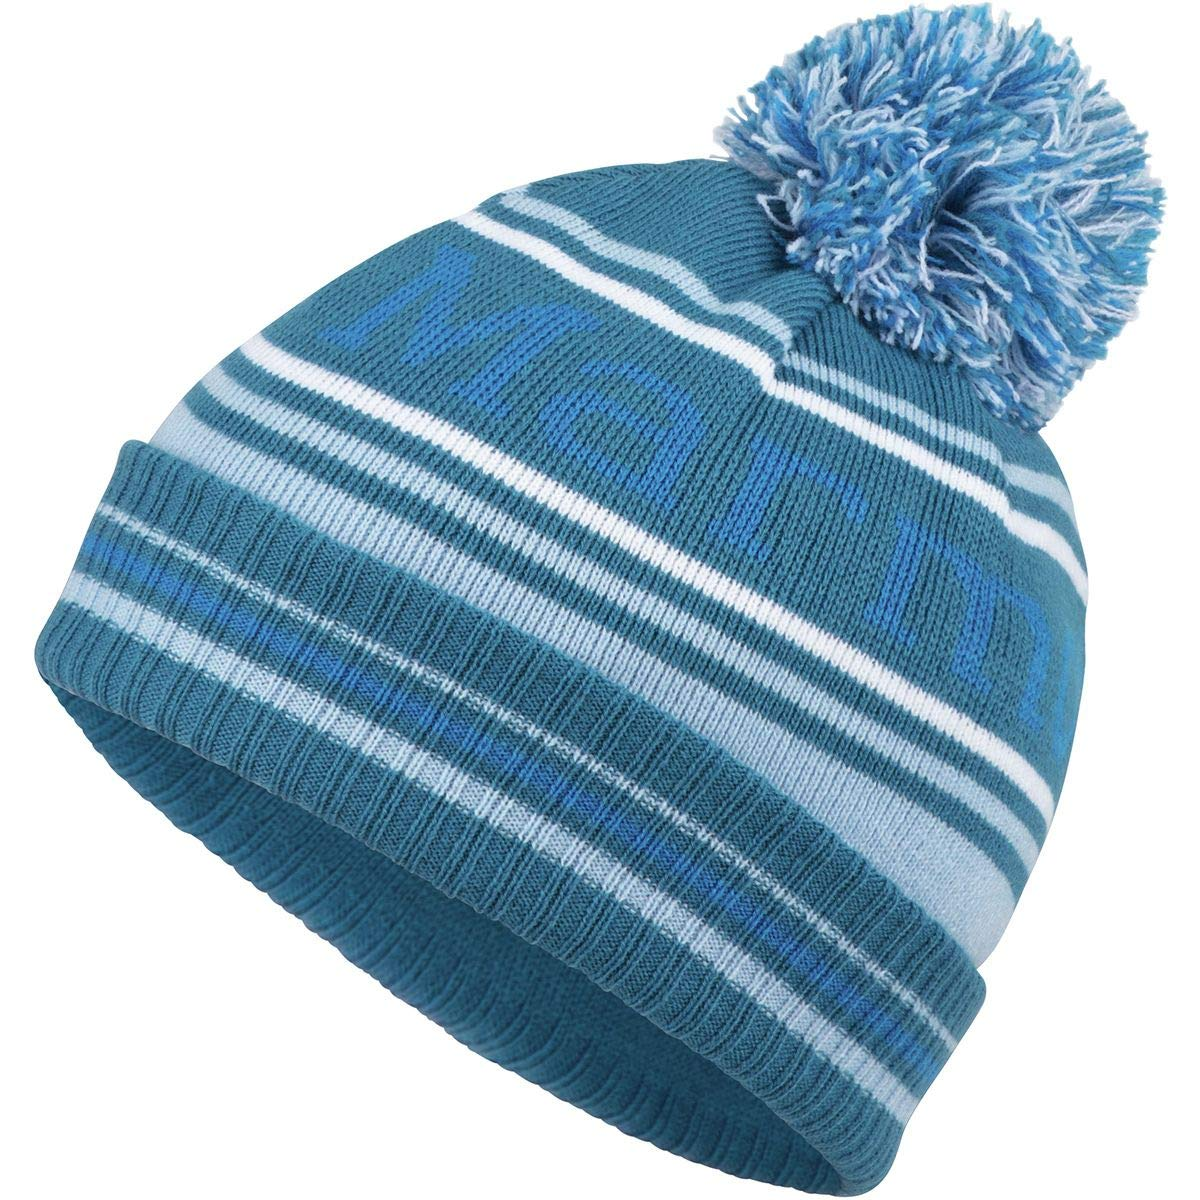 d0b48996df5 Amazon.com  Marmot Retro Pom Hat - Boys  Sapphire